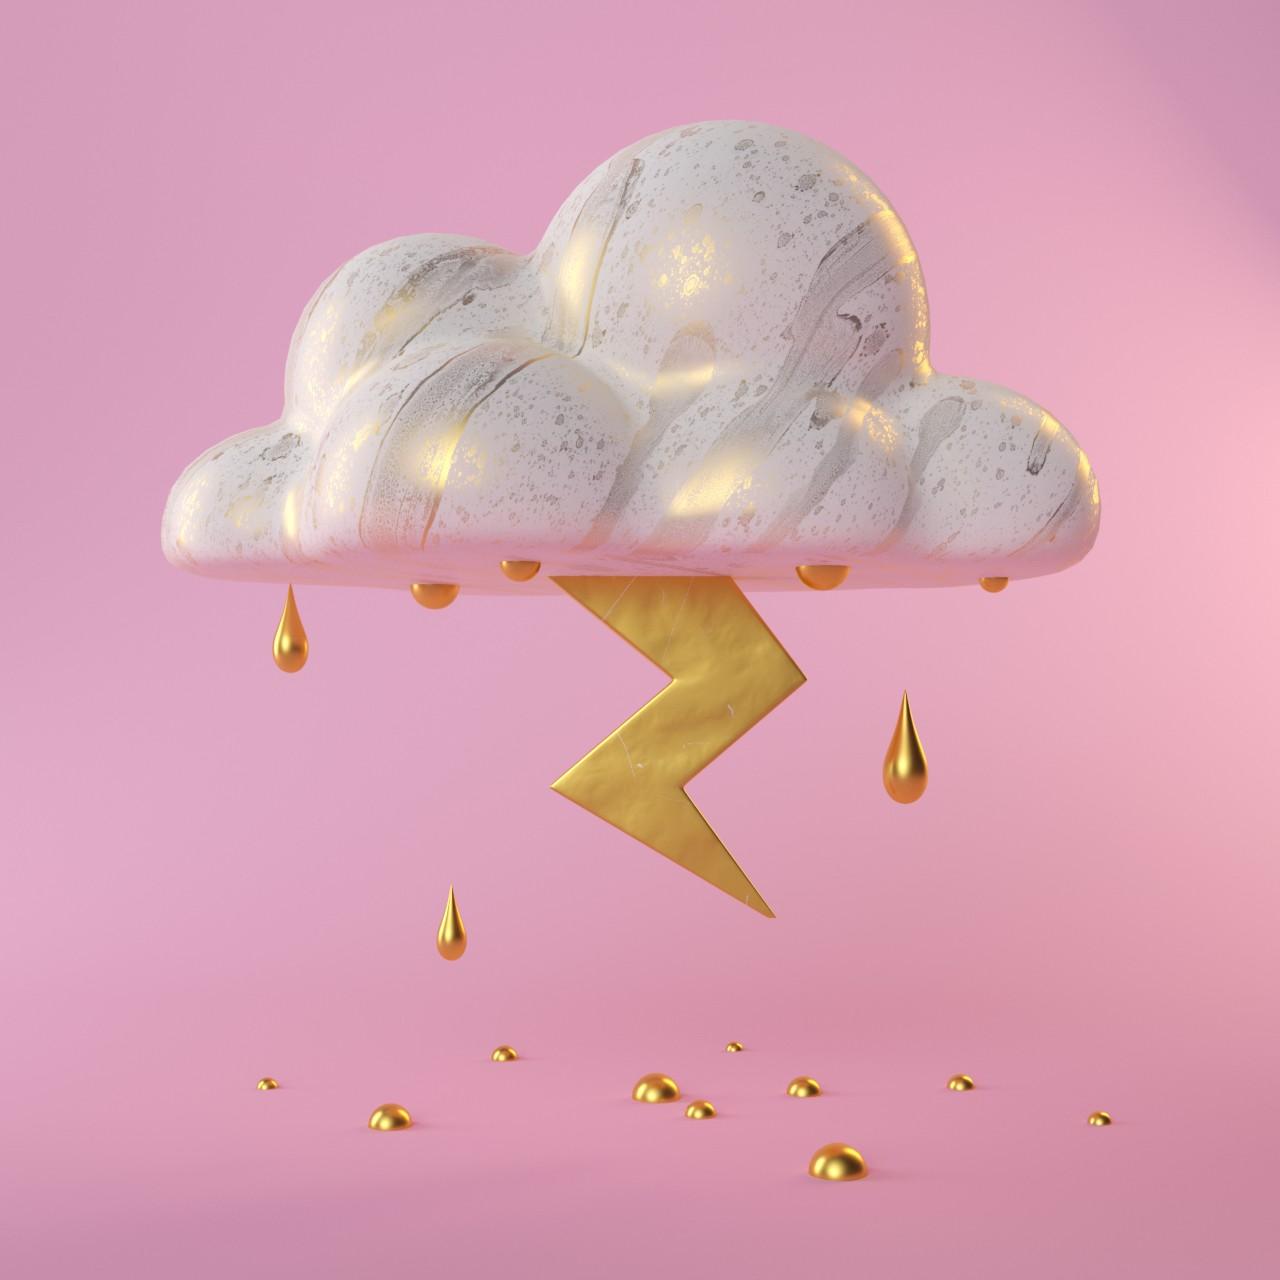 candy_clouds_1.jpg